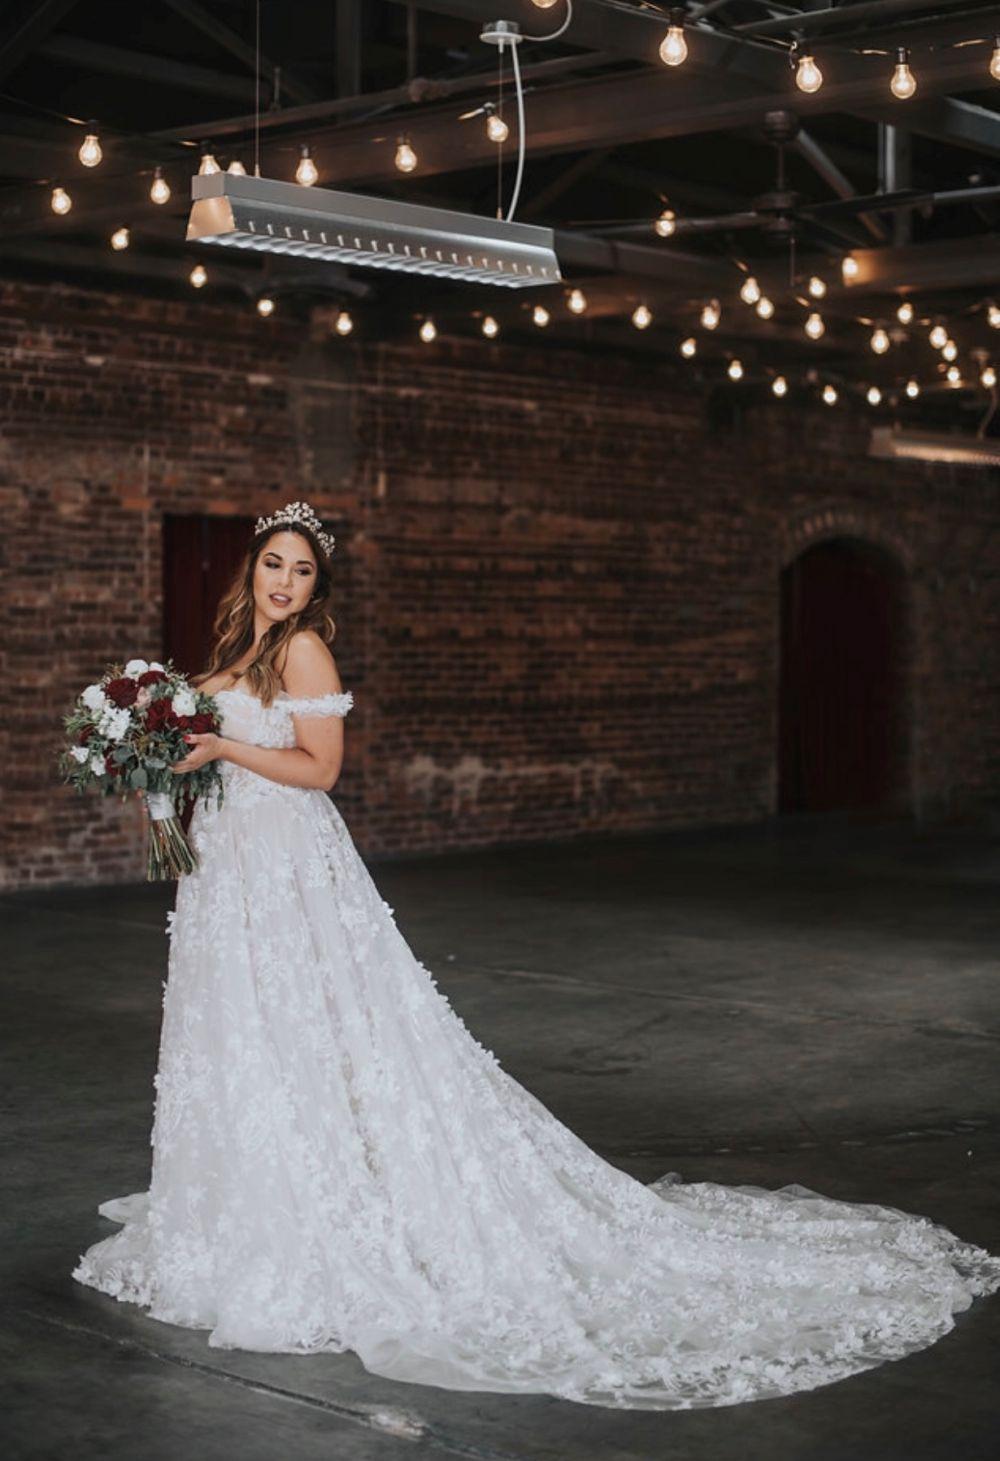 Wedding Flowers | The Flower Gallery | Tampa's Best Florist